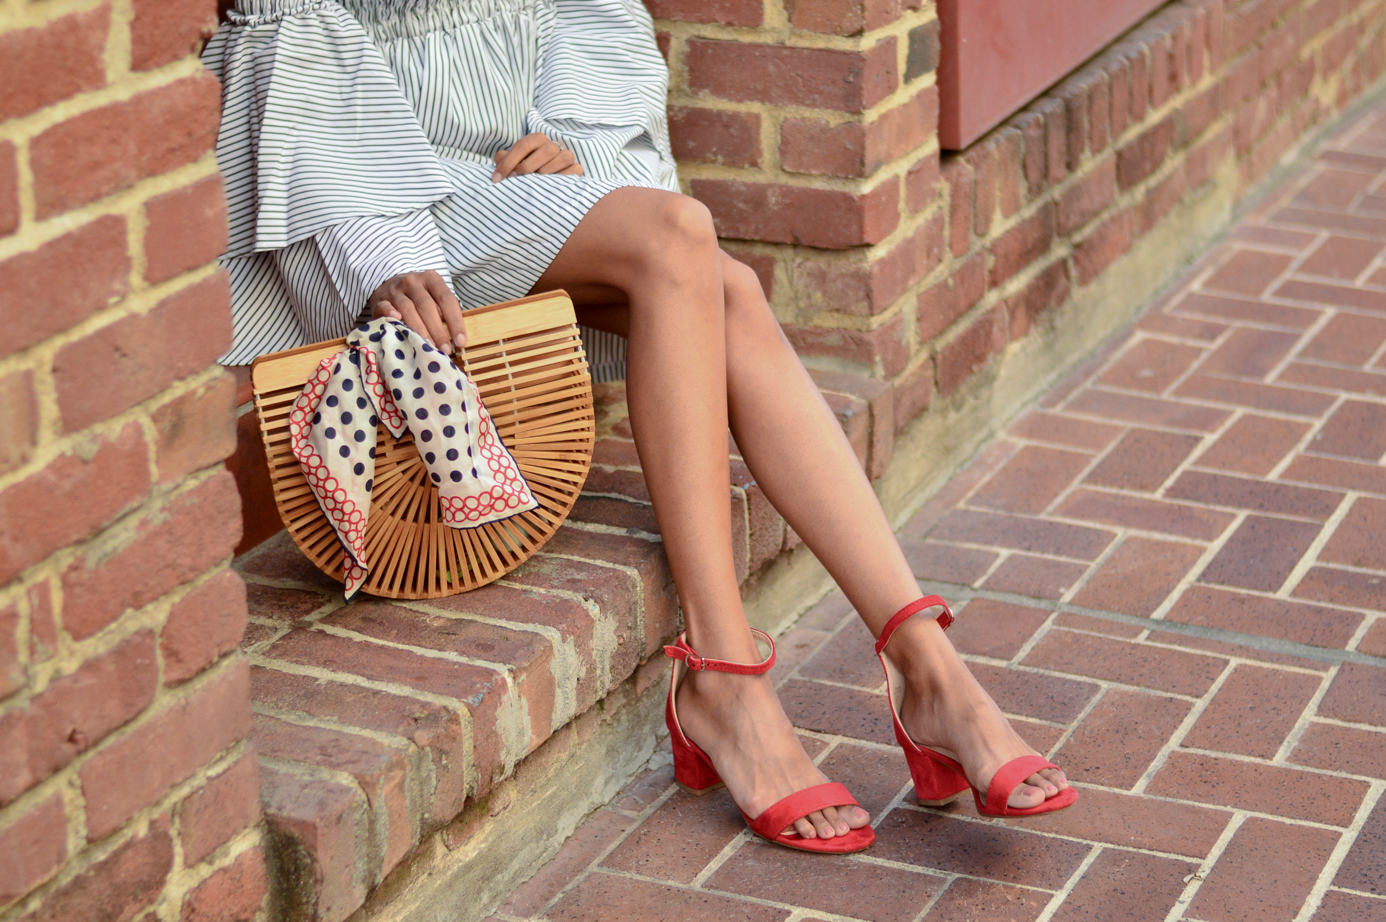 bell-sleeves-ruffles-stripes-dress-red-block-sandals-ark-bag-cult-gaia-summer-style 8